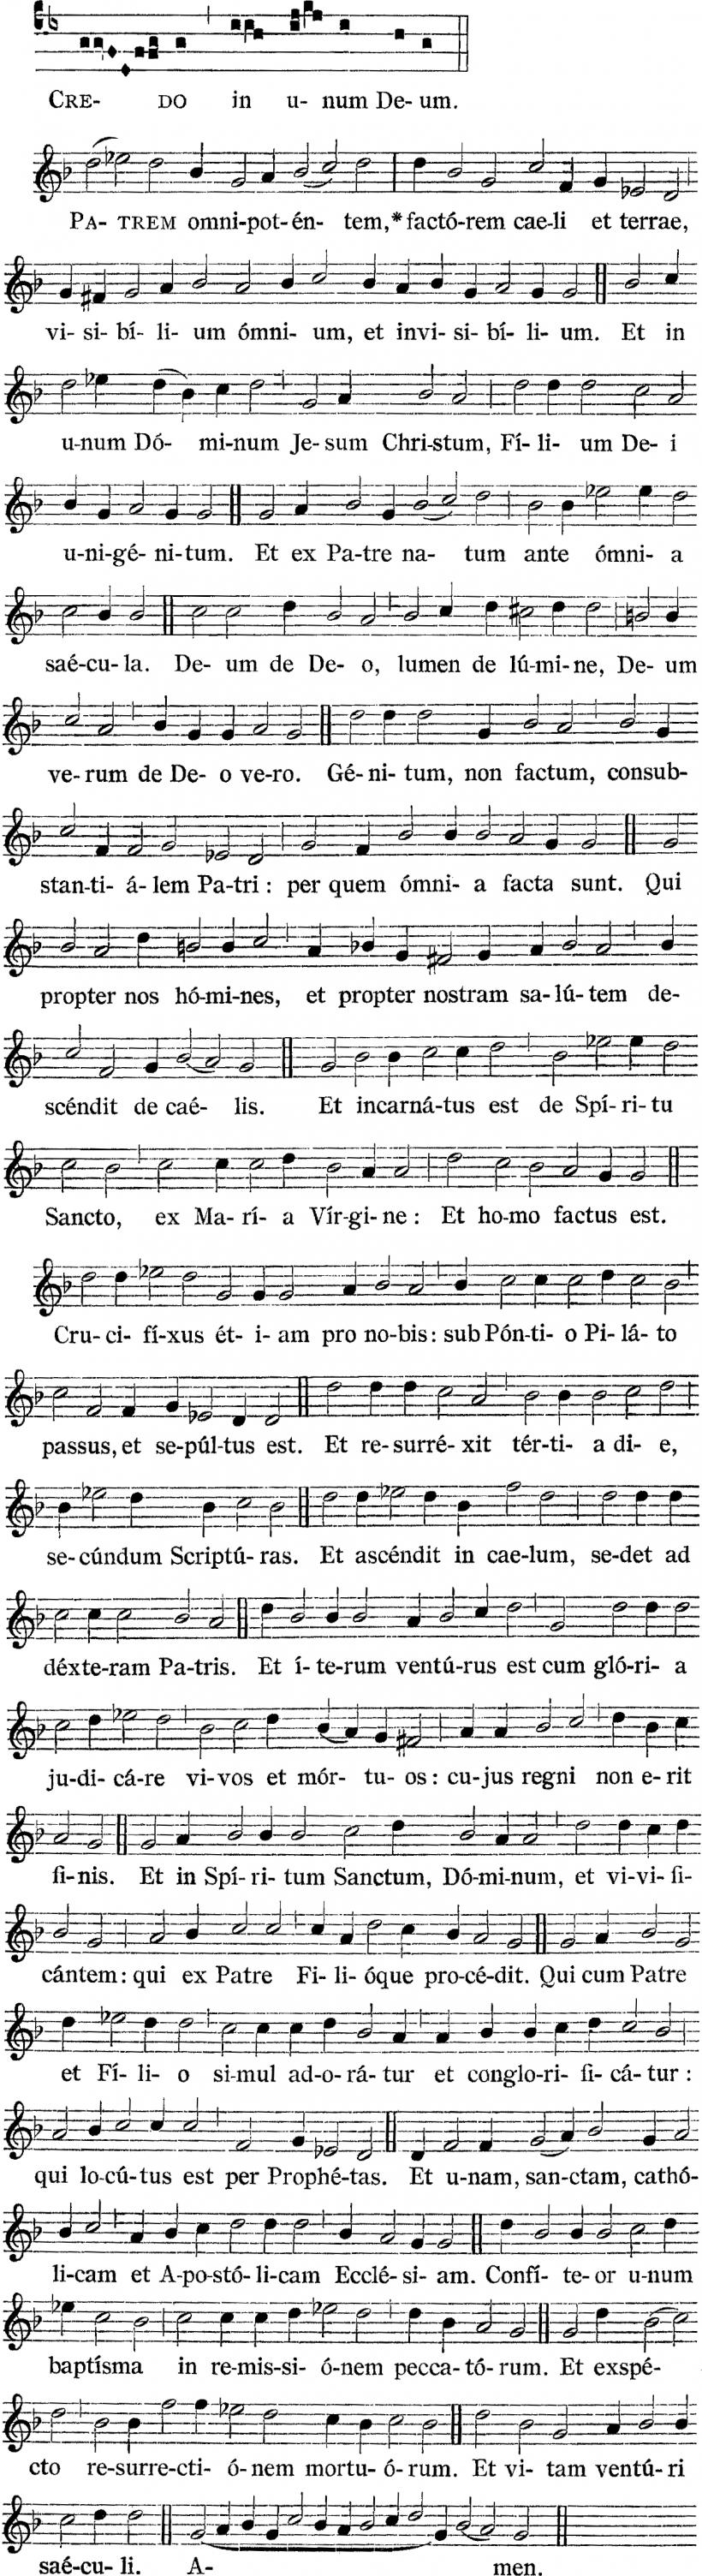 Messe royale du IInd ton d'Henry du Mont - Credo